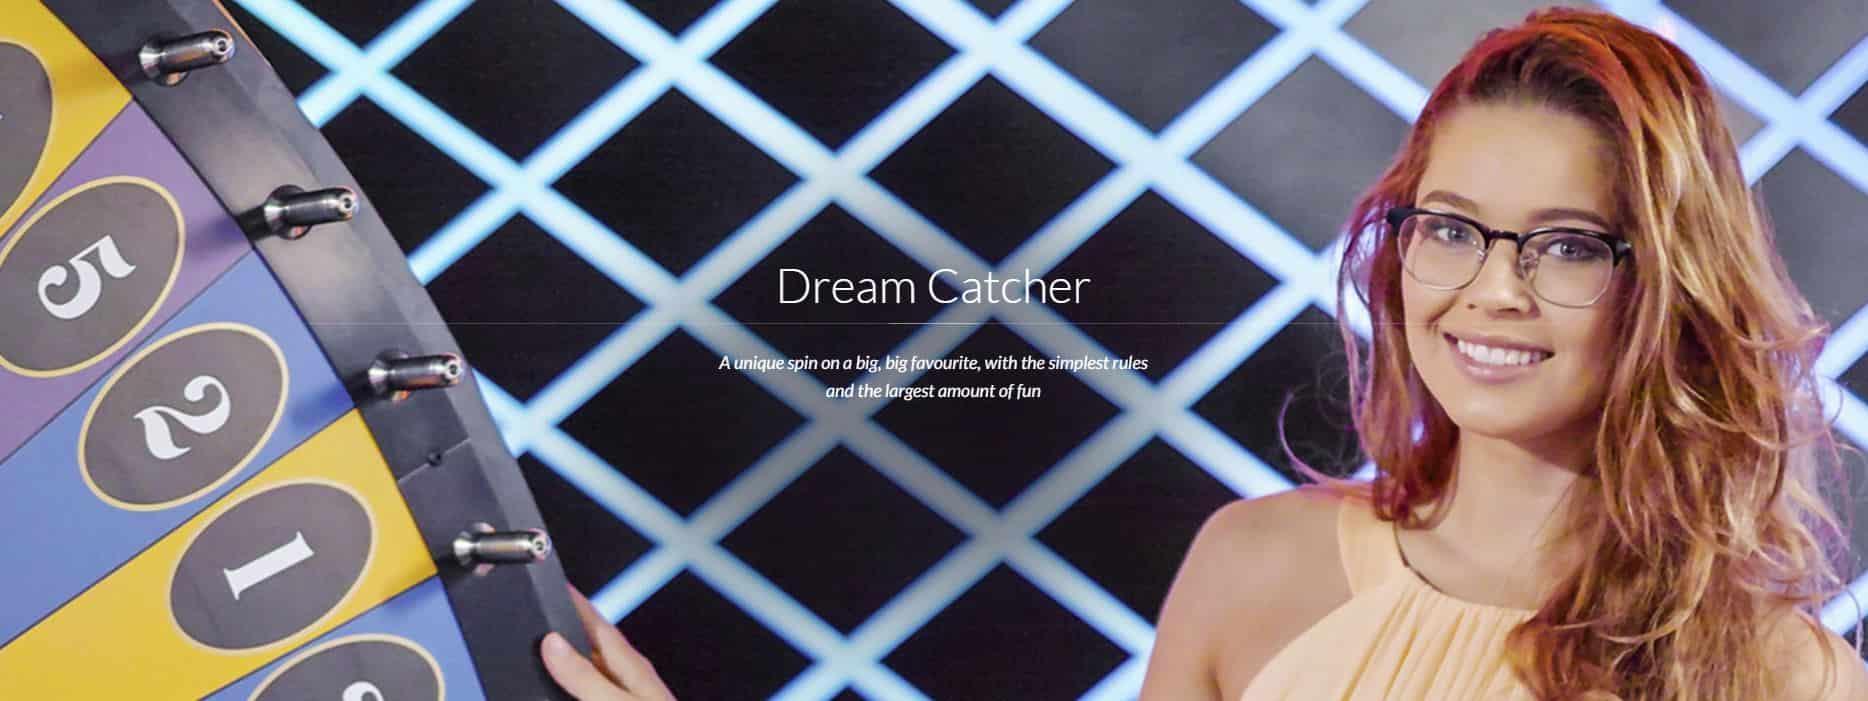 Dream Catcher Play Now